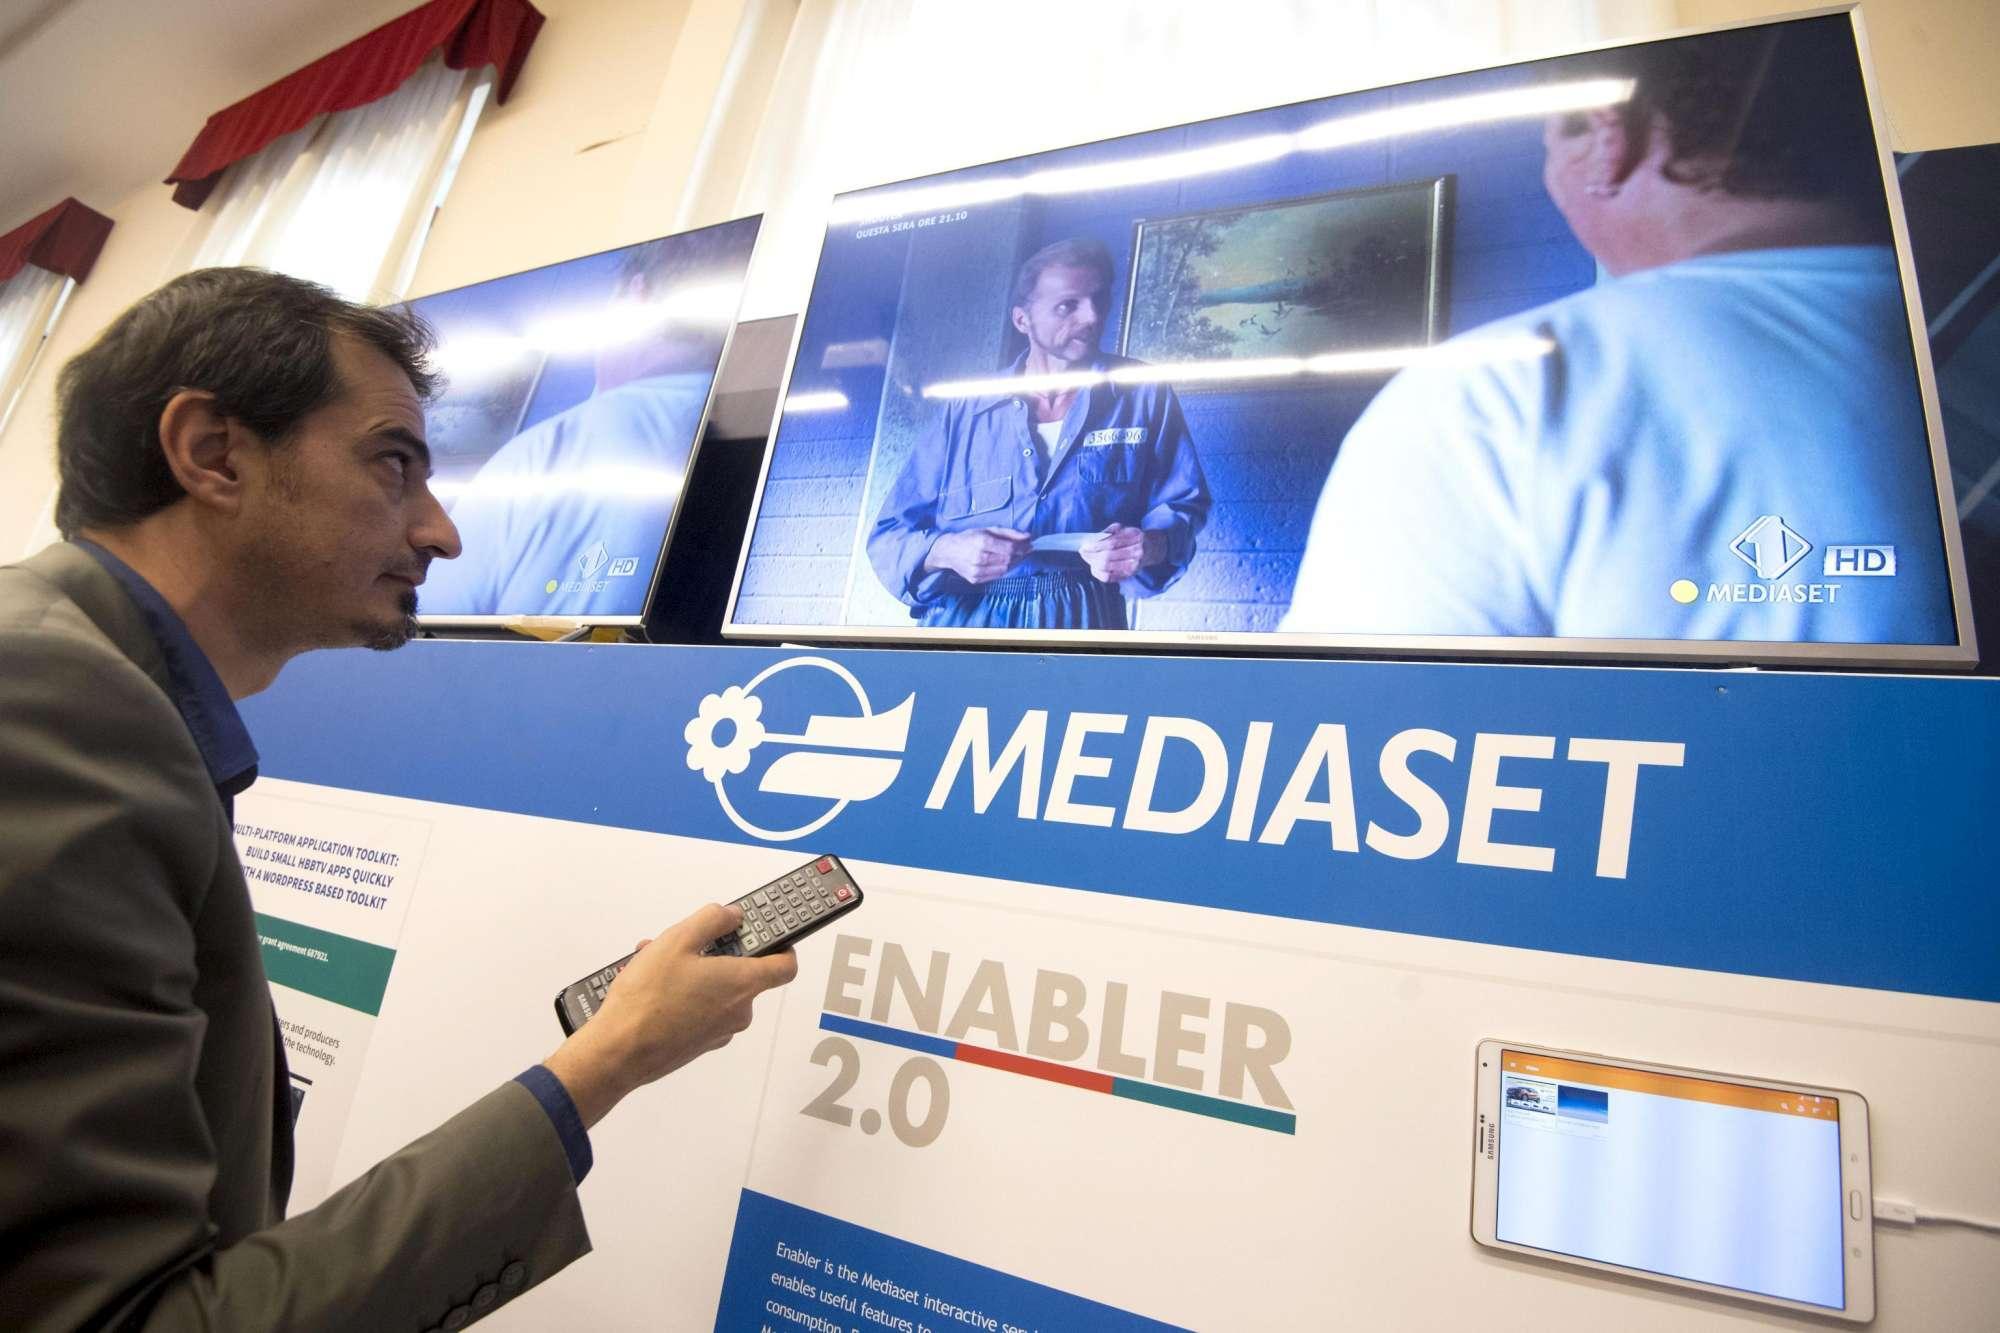 Tv ibrida e interattiva, piattaforma Mediaset Enabler 2.0 a partire da giugno 2018